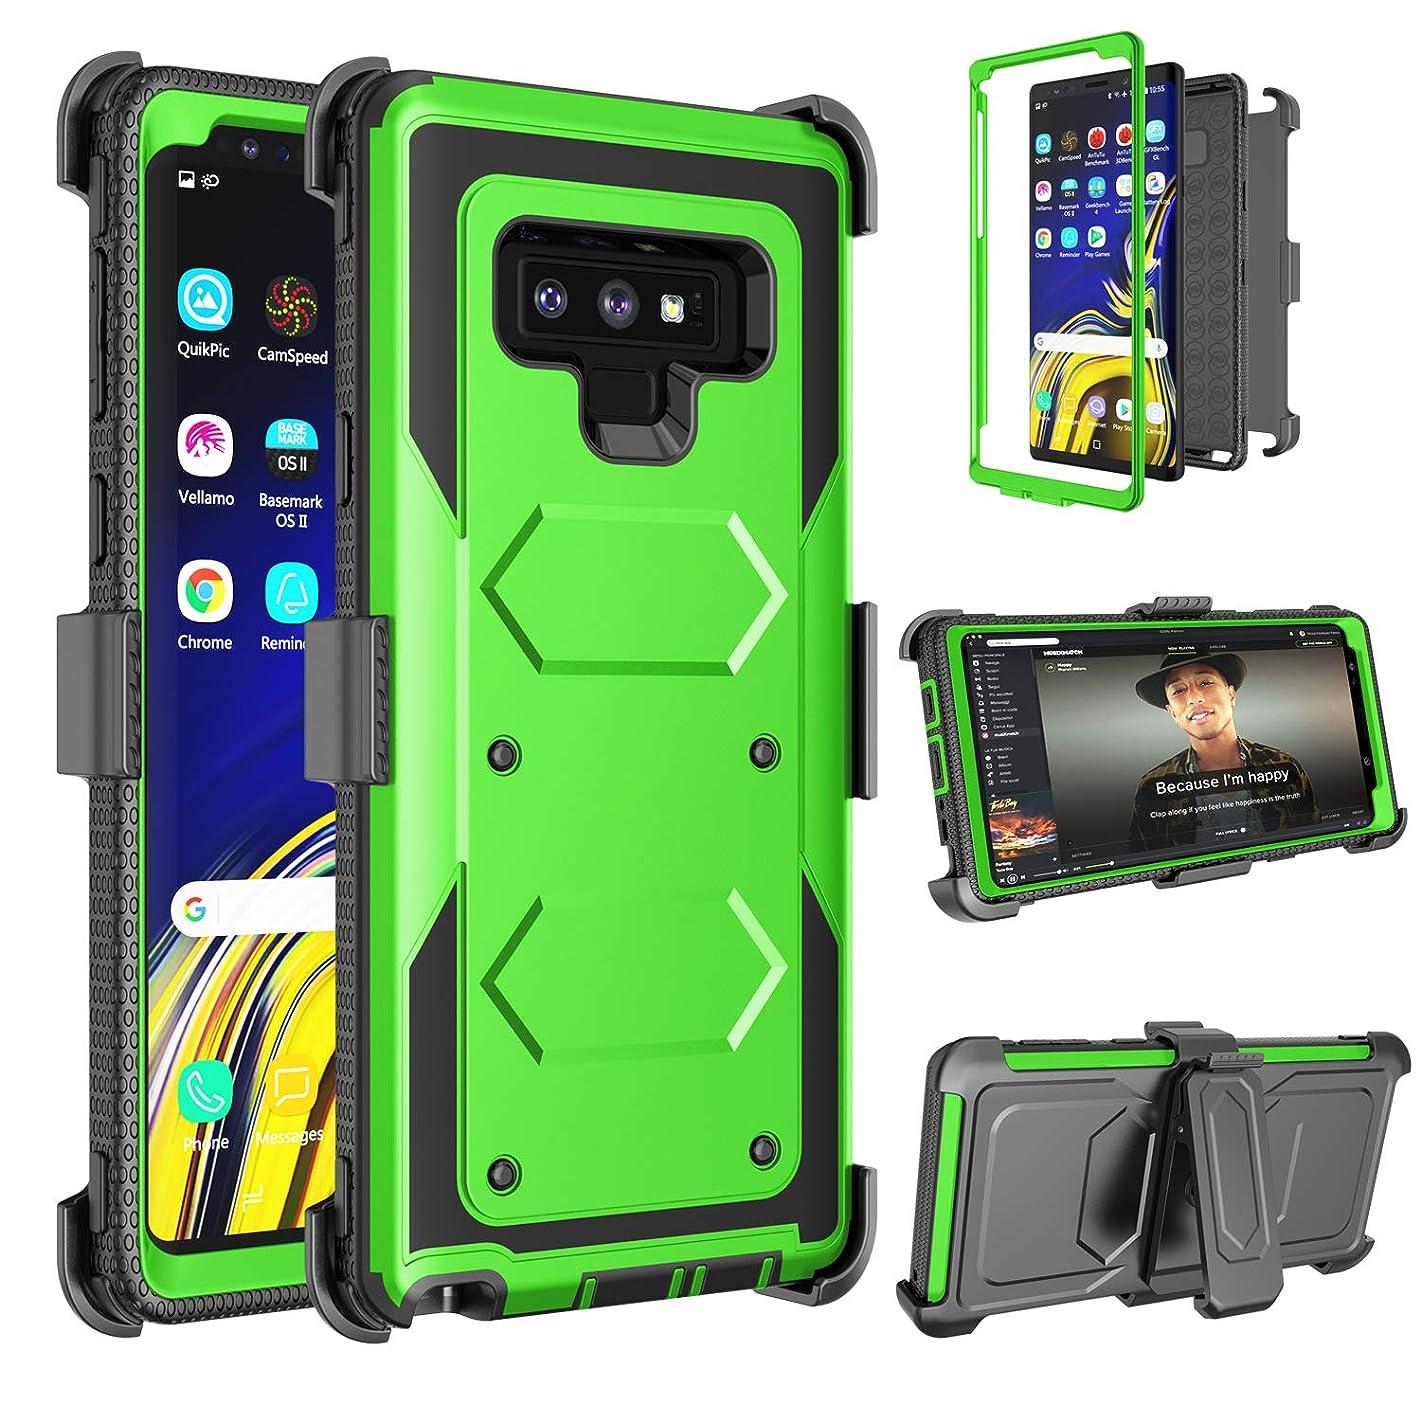 Tinysaturn Samsung Galaxy Note 9 Case, for Galaxy Note 9 Case, [Yvenus] Heavy Duty Shockproof Holster Belt Kickstand Cover - Grass Green